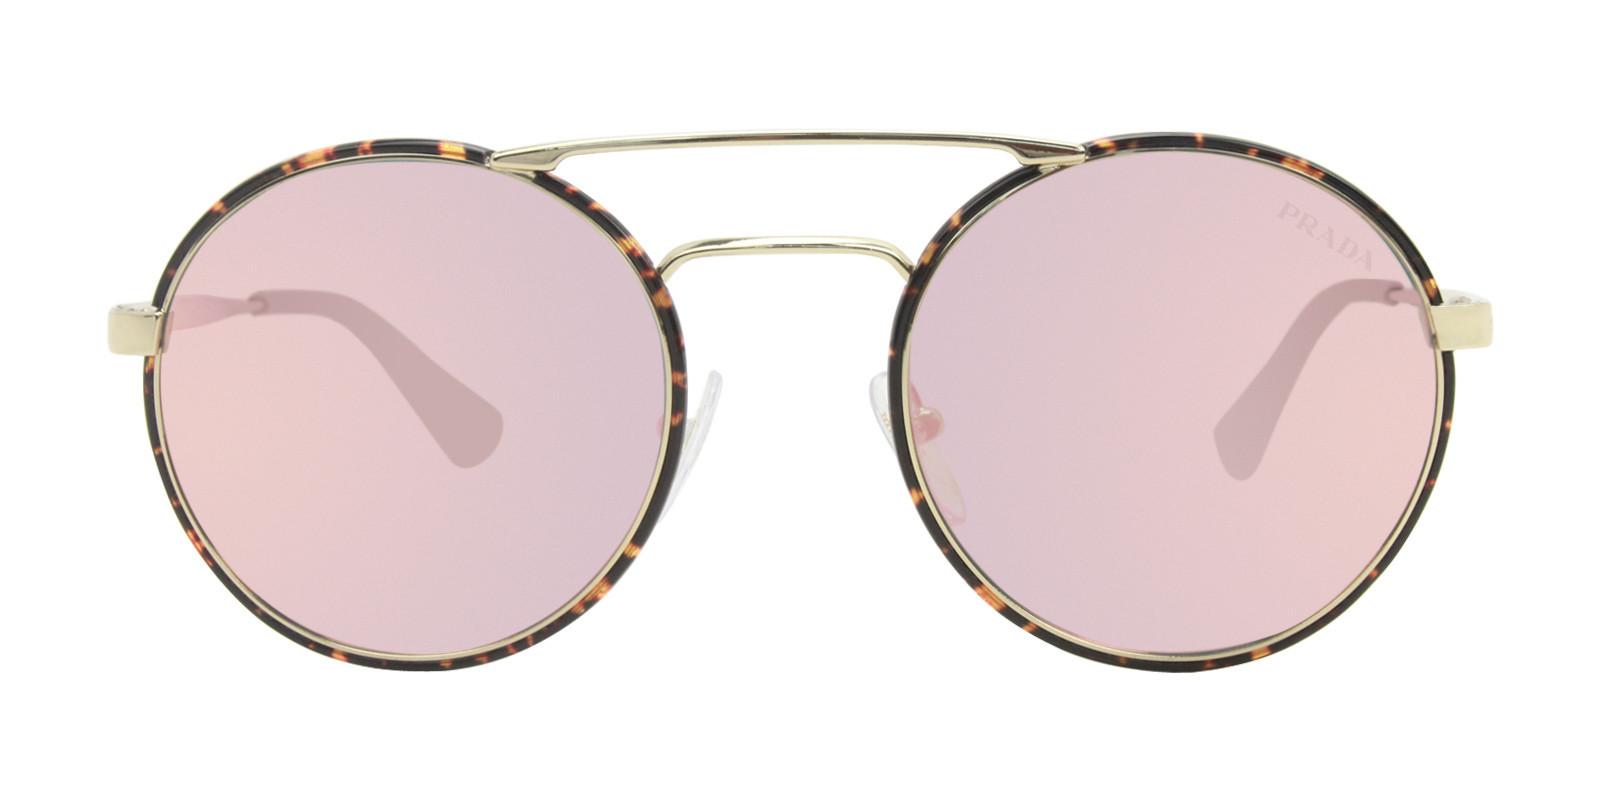 Prada Round Glasses